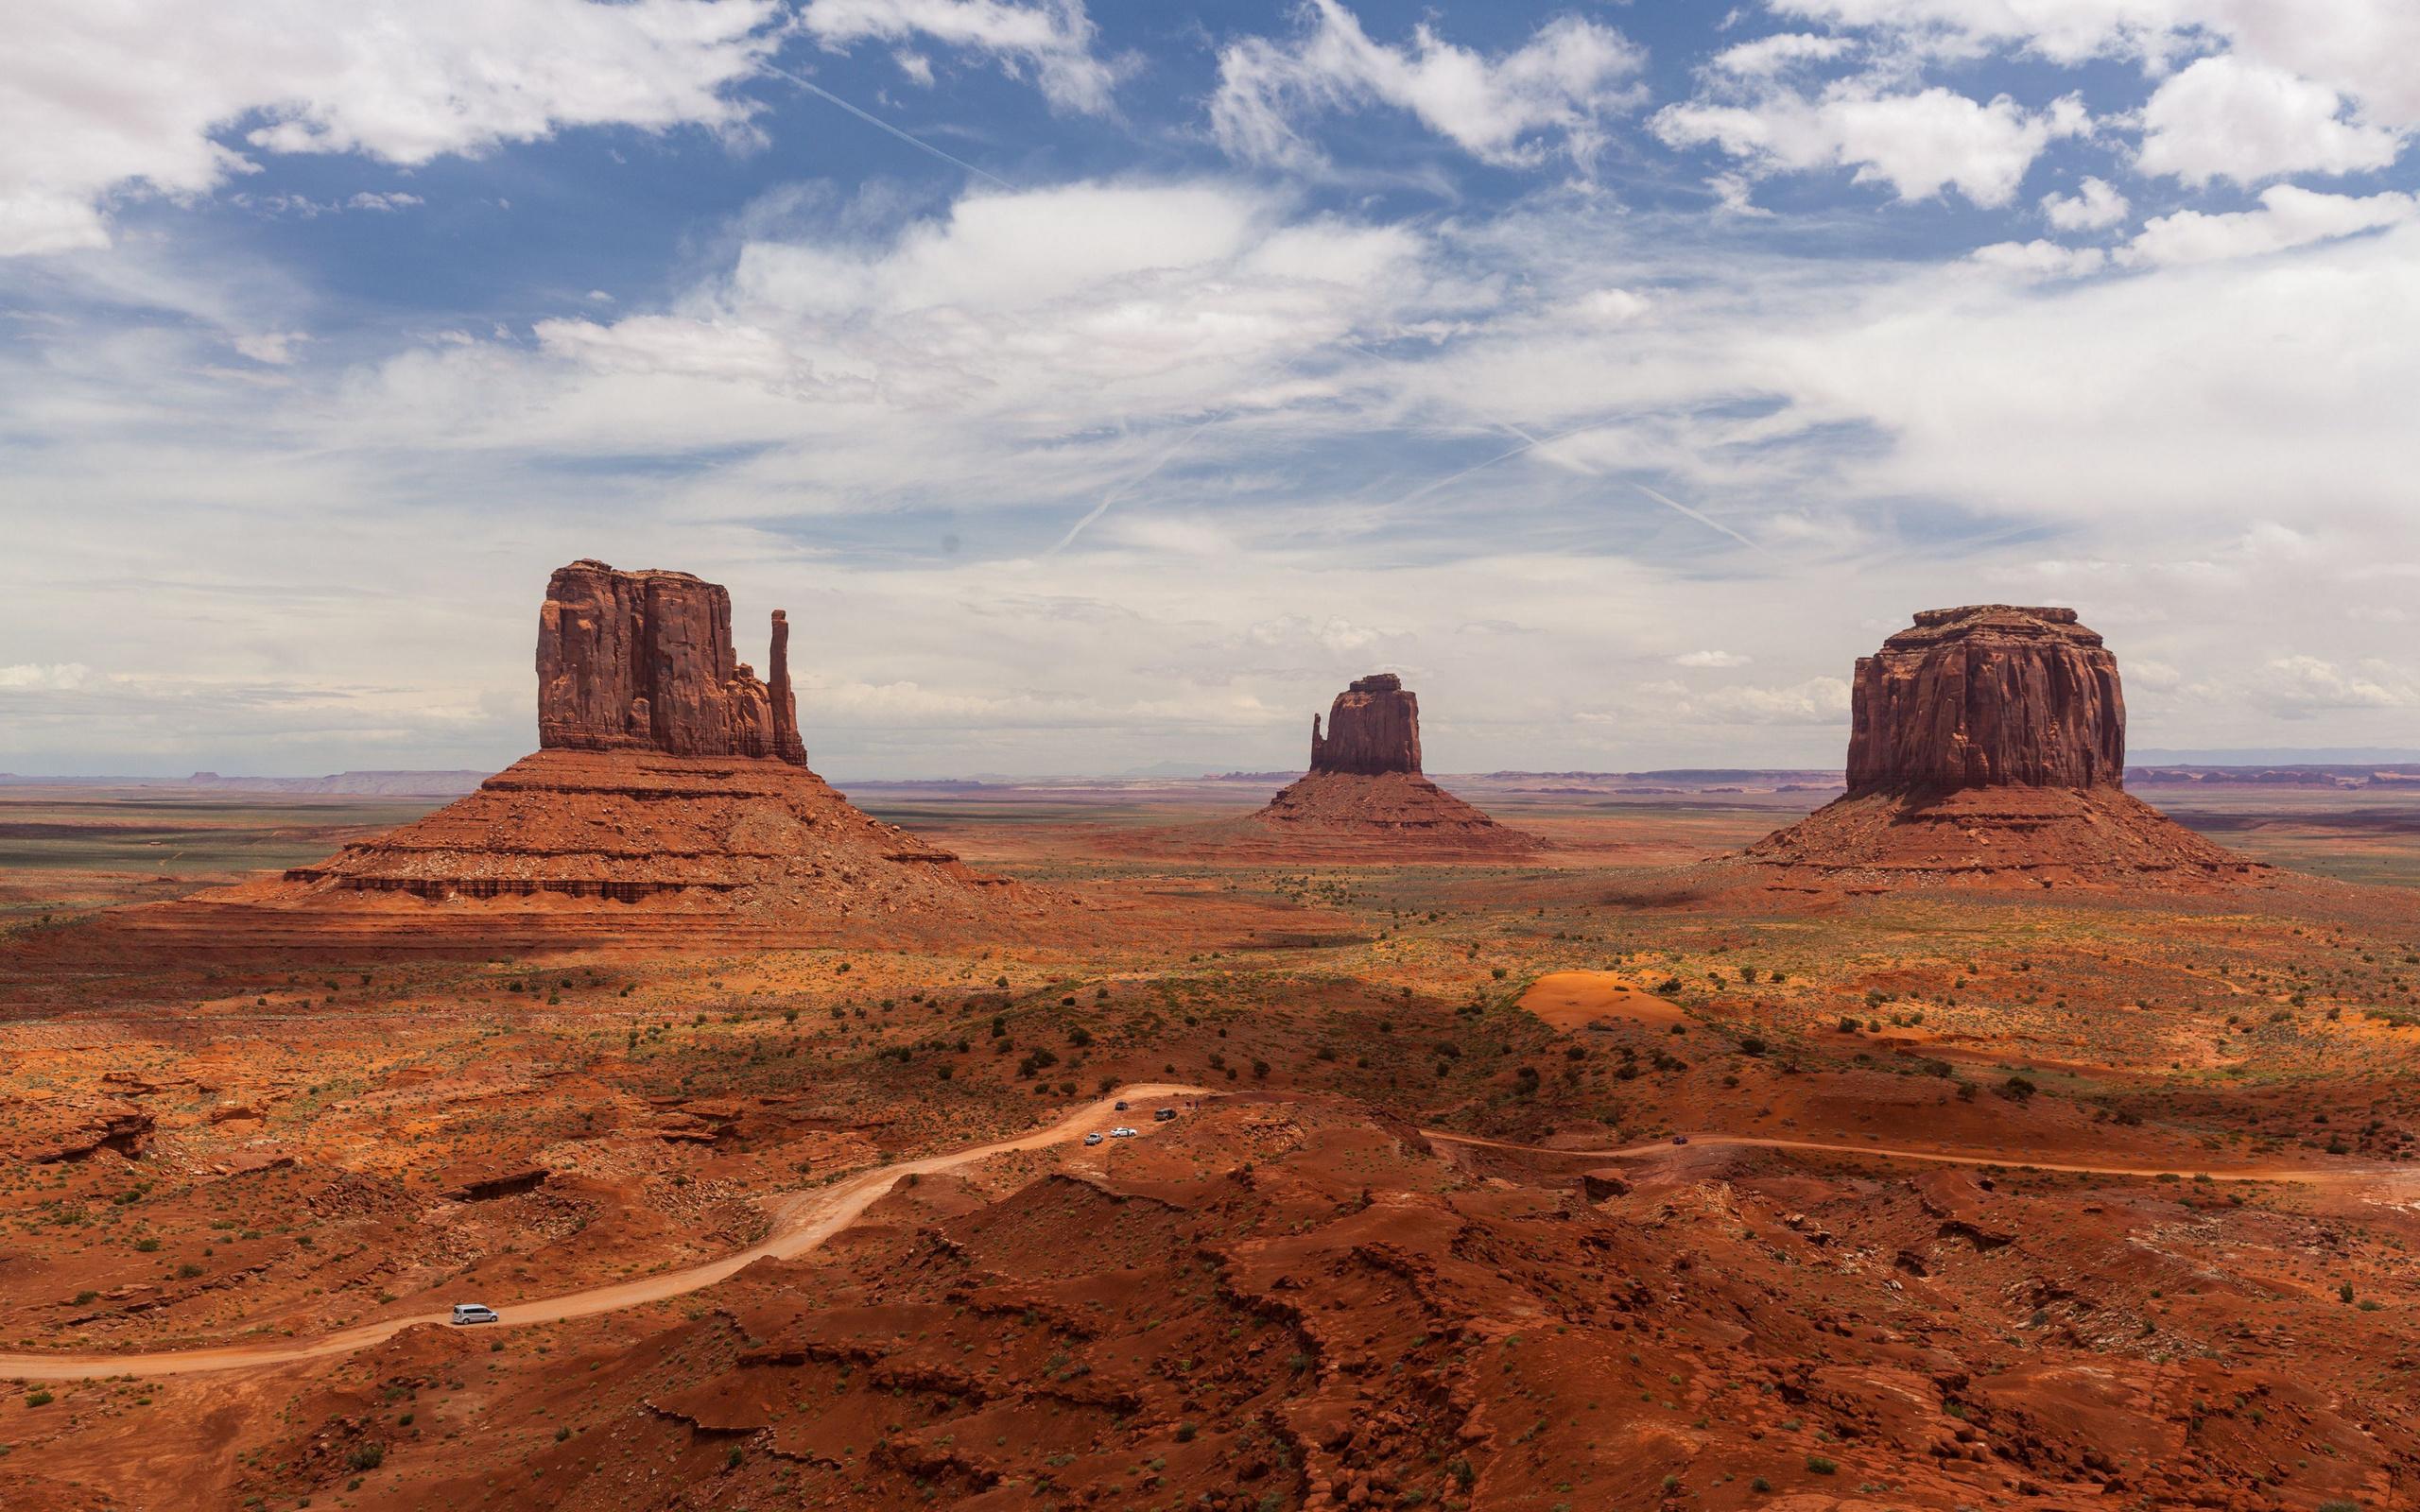 пустыня, дорога, скала